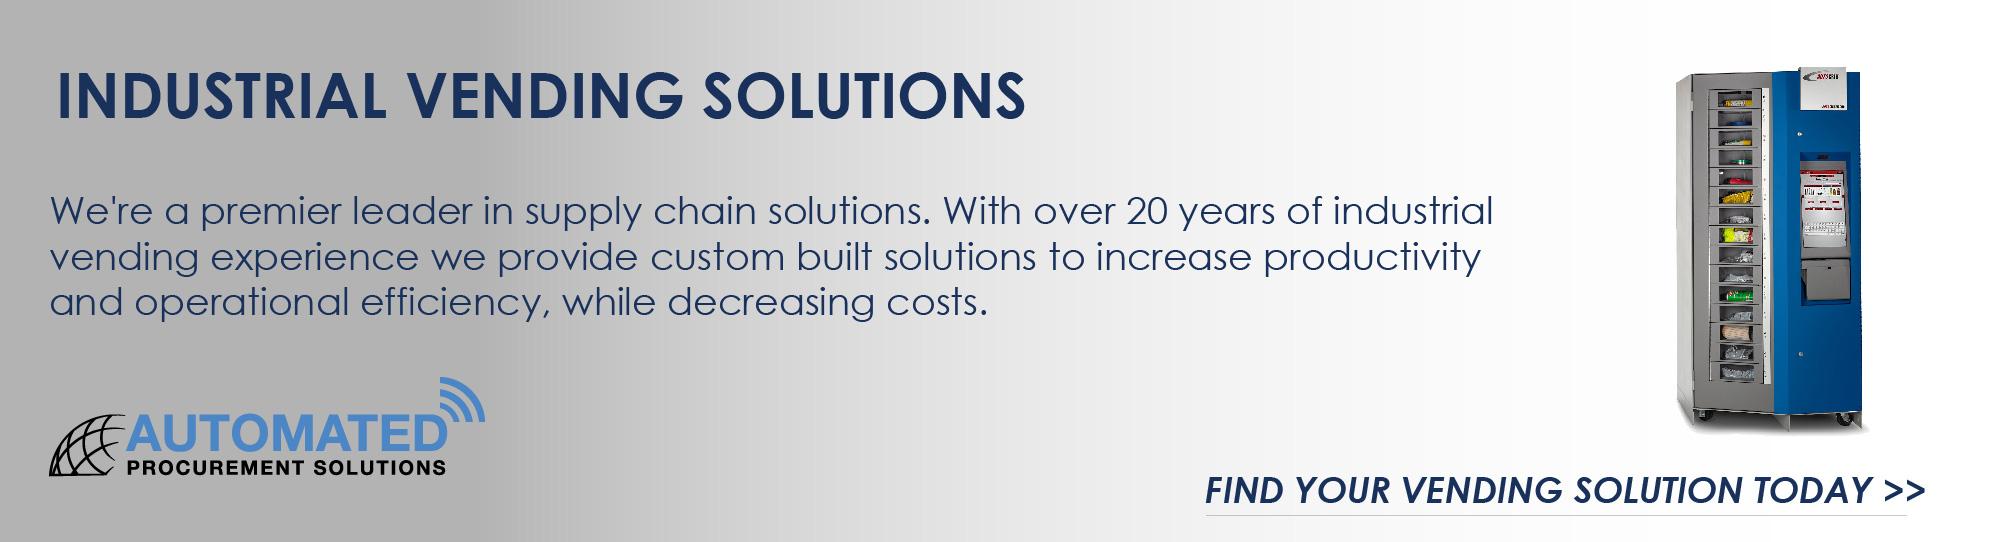 Industrial Vending Solutions